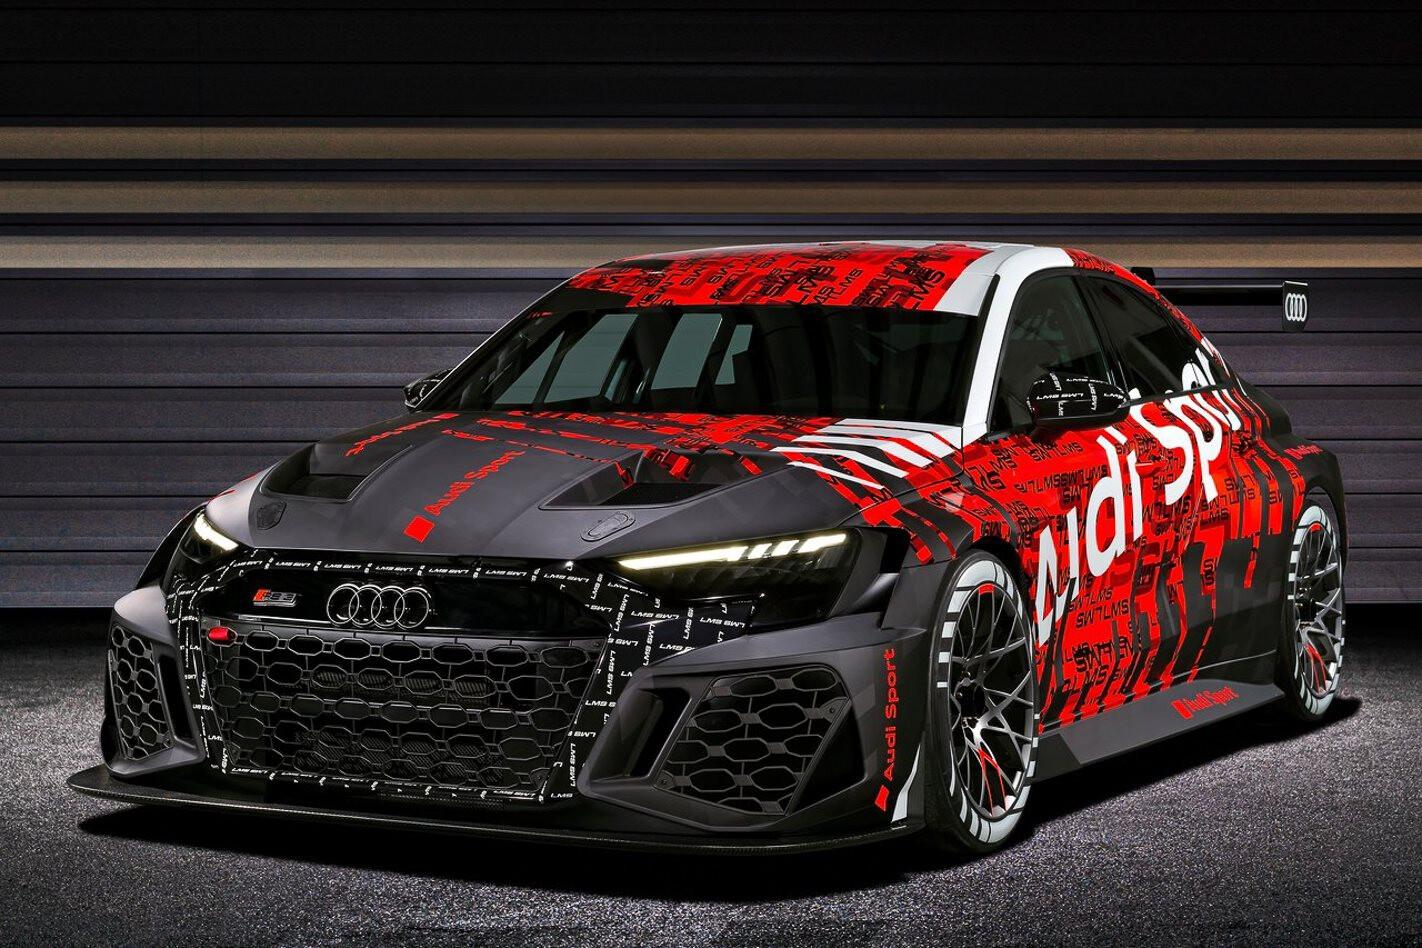 Audi RS 3 LMS Racecar 2021 1280 01 3 Jpg